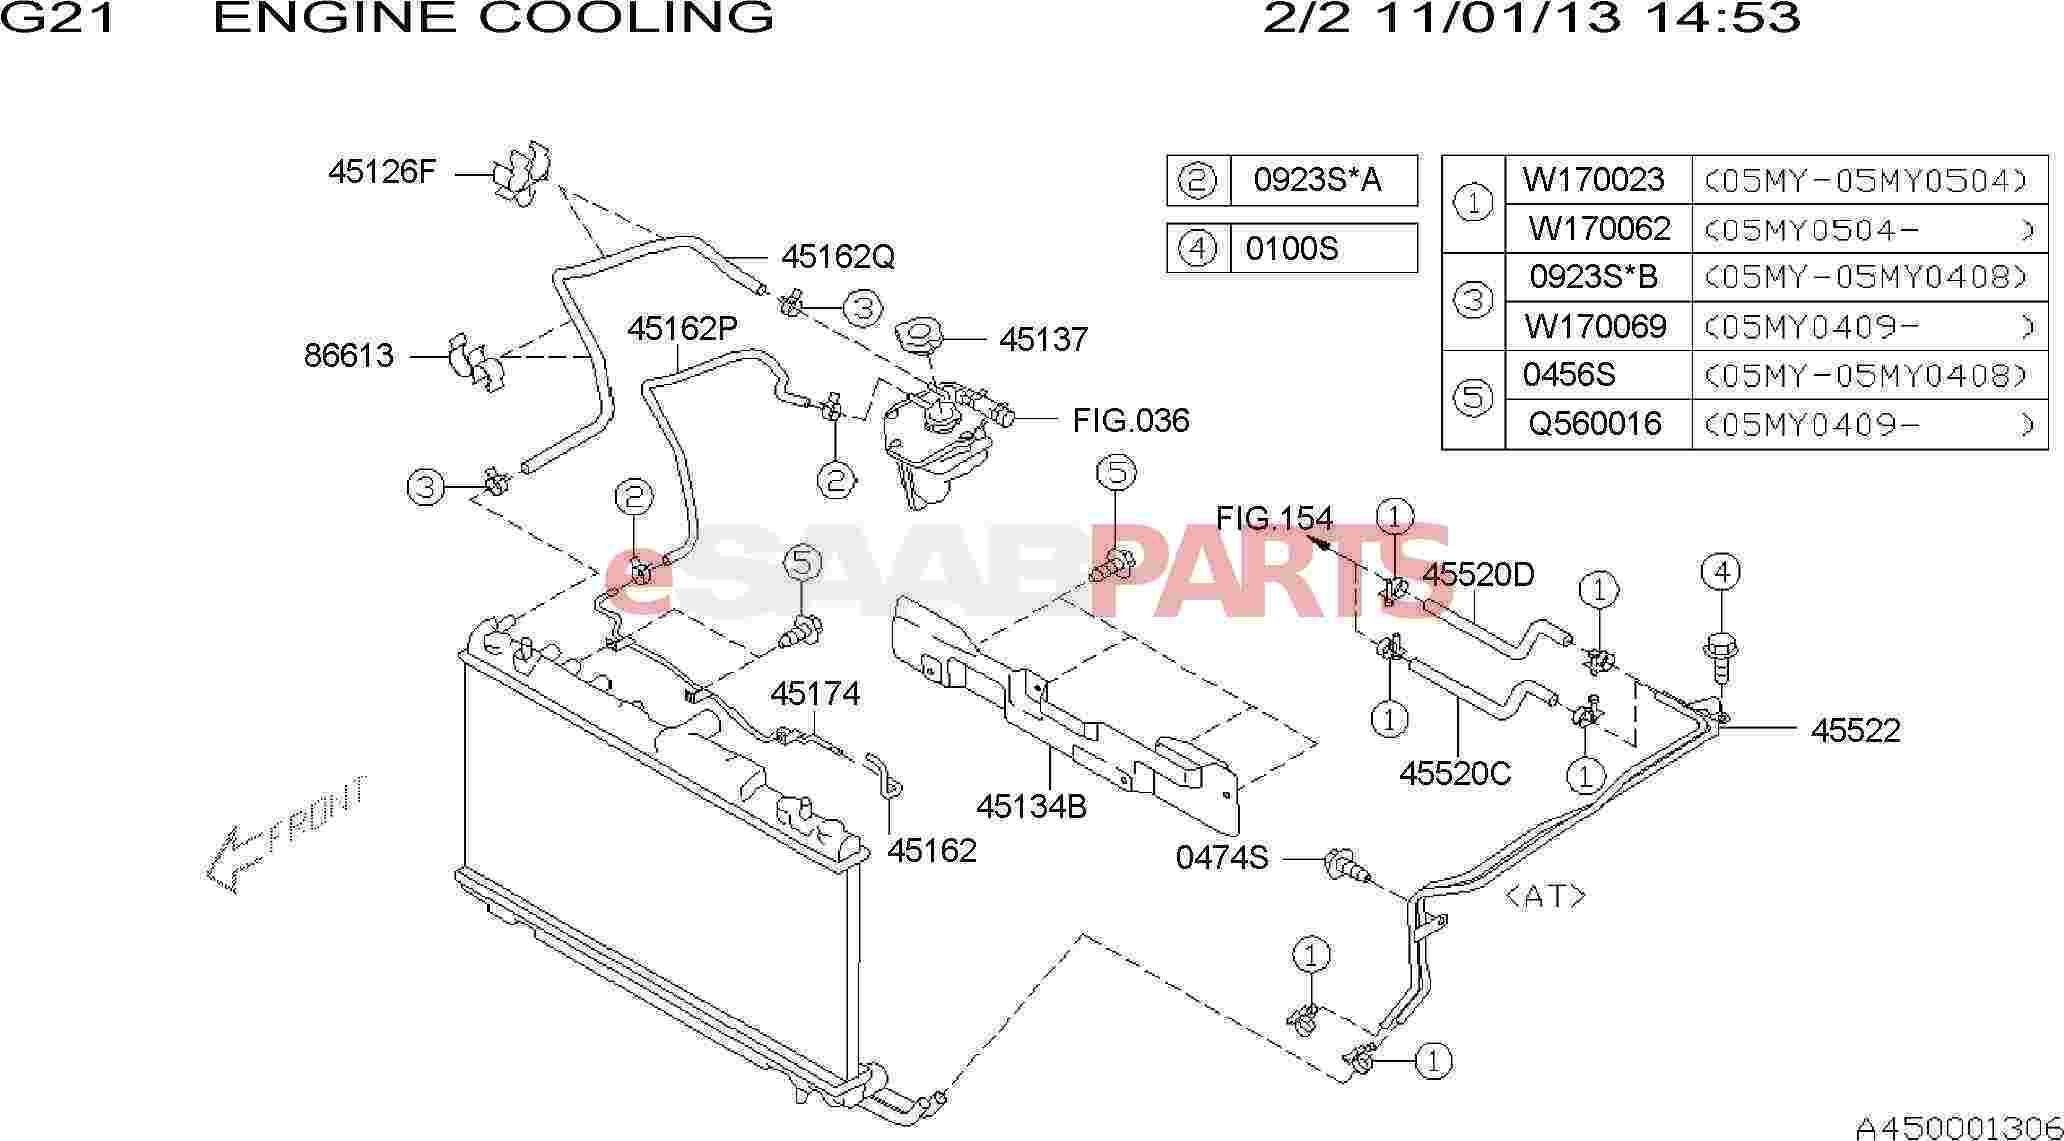 eSaabParts.com - Saab 9-2x > Engine Parts > Heating & Cooling System > ENGINE  COOLING: AT OIL COOLER PIPE & HOSE OVER FLOW